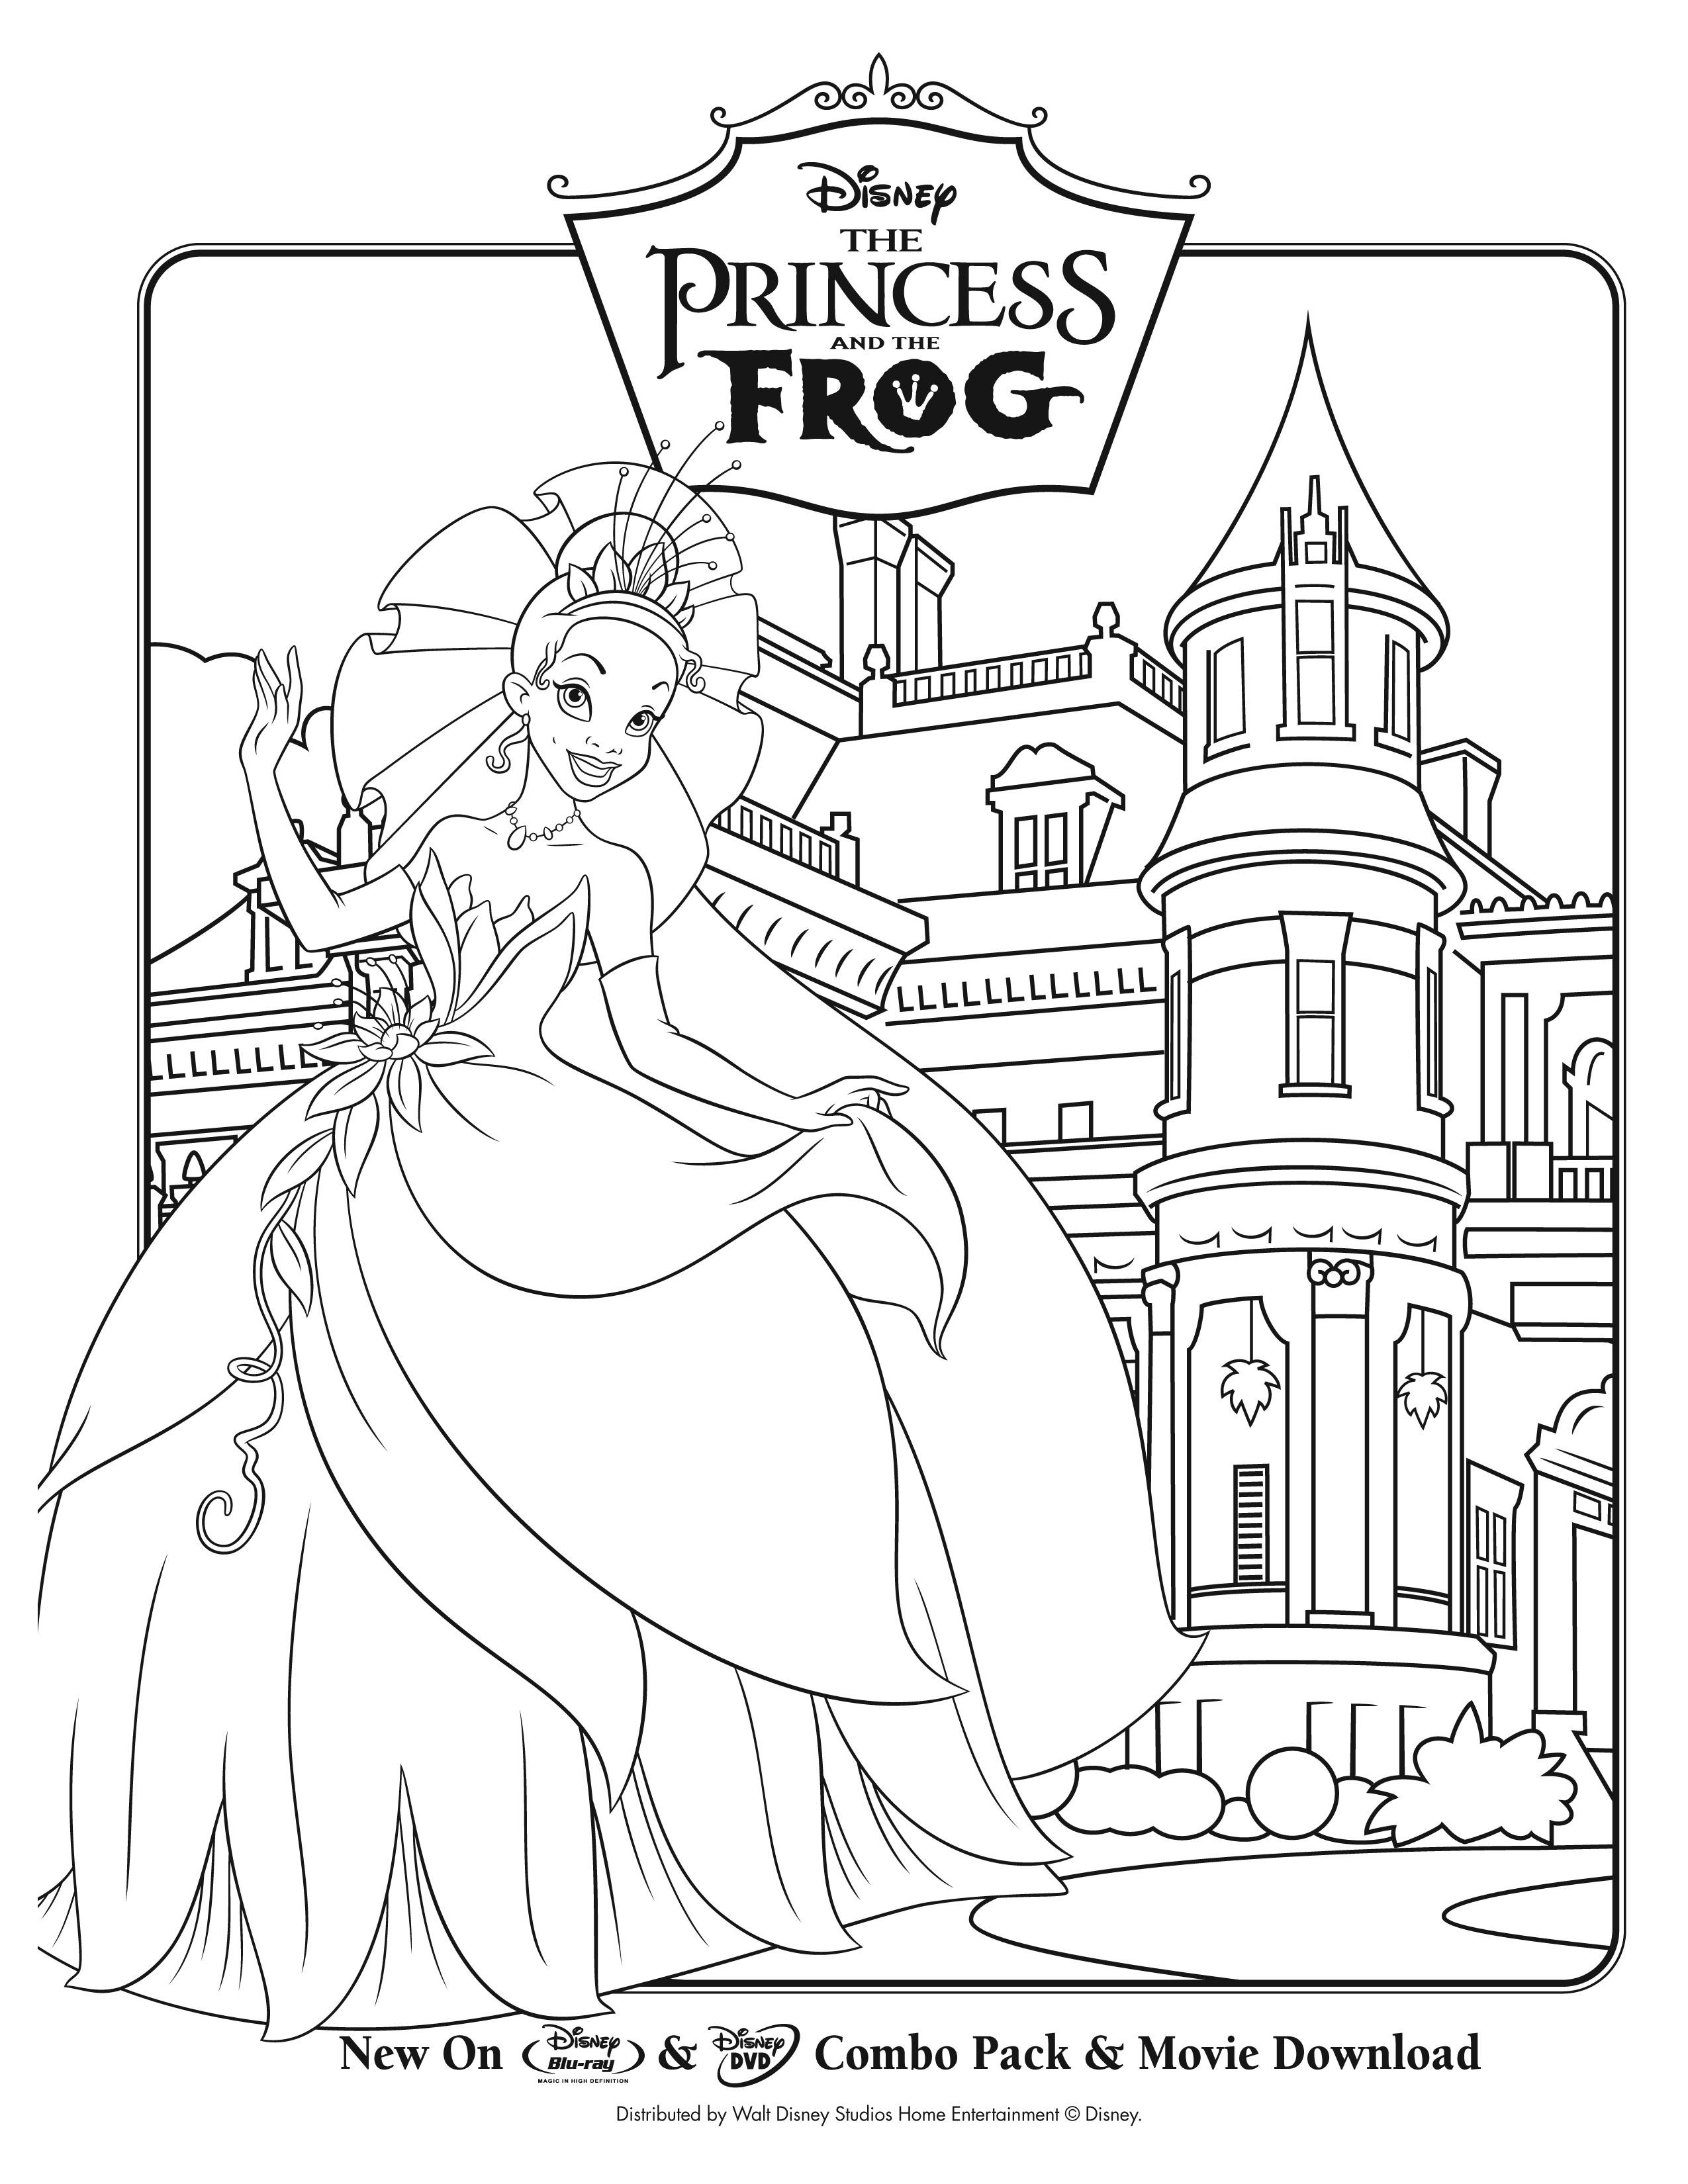 Princess grenouille 5 coloriage la princesse et la grenouille coloriages pour enfants - Coloriage magnifique ...